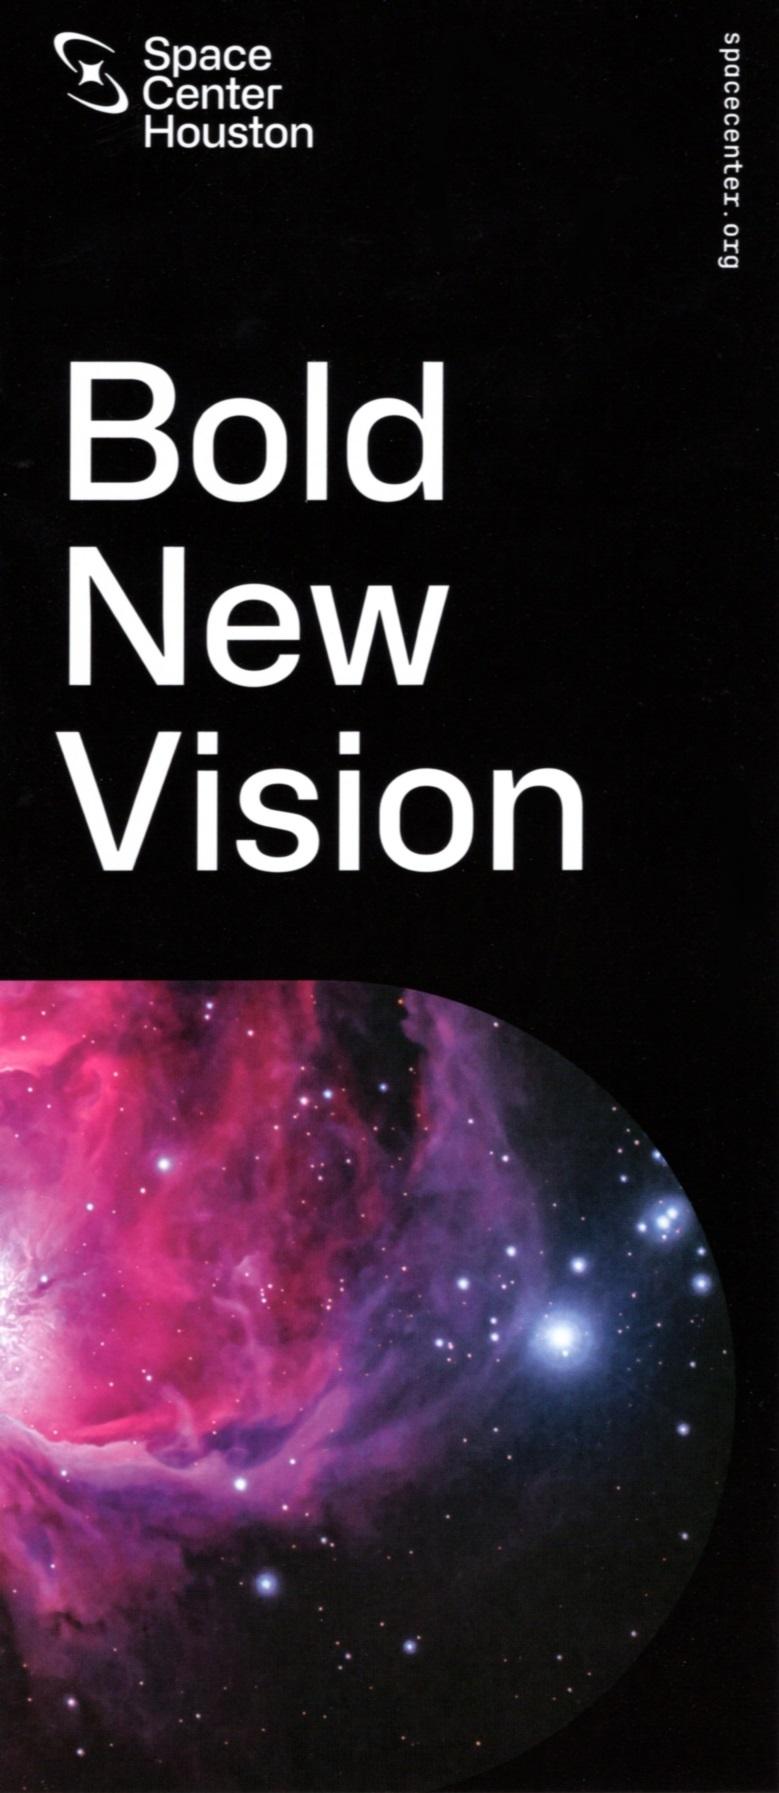 Space Center Houston brochure thumbnail